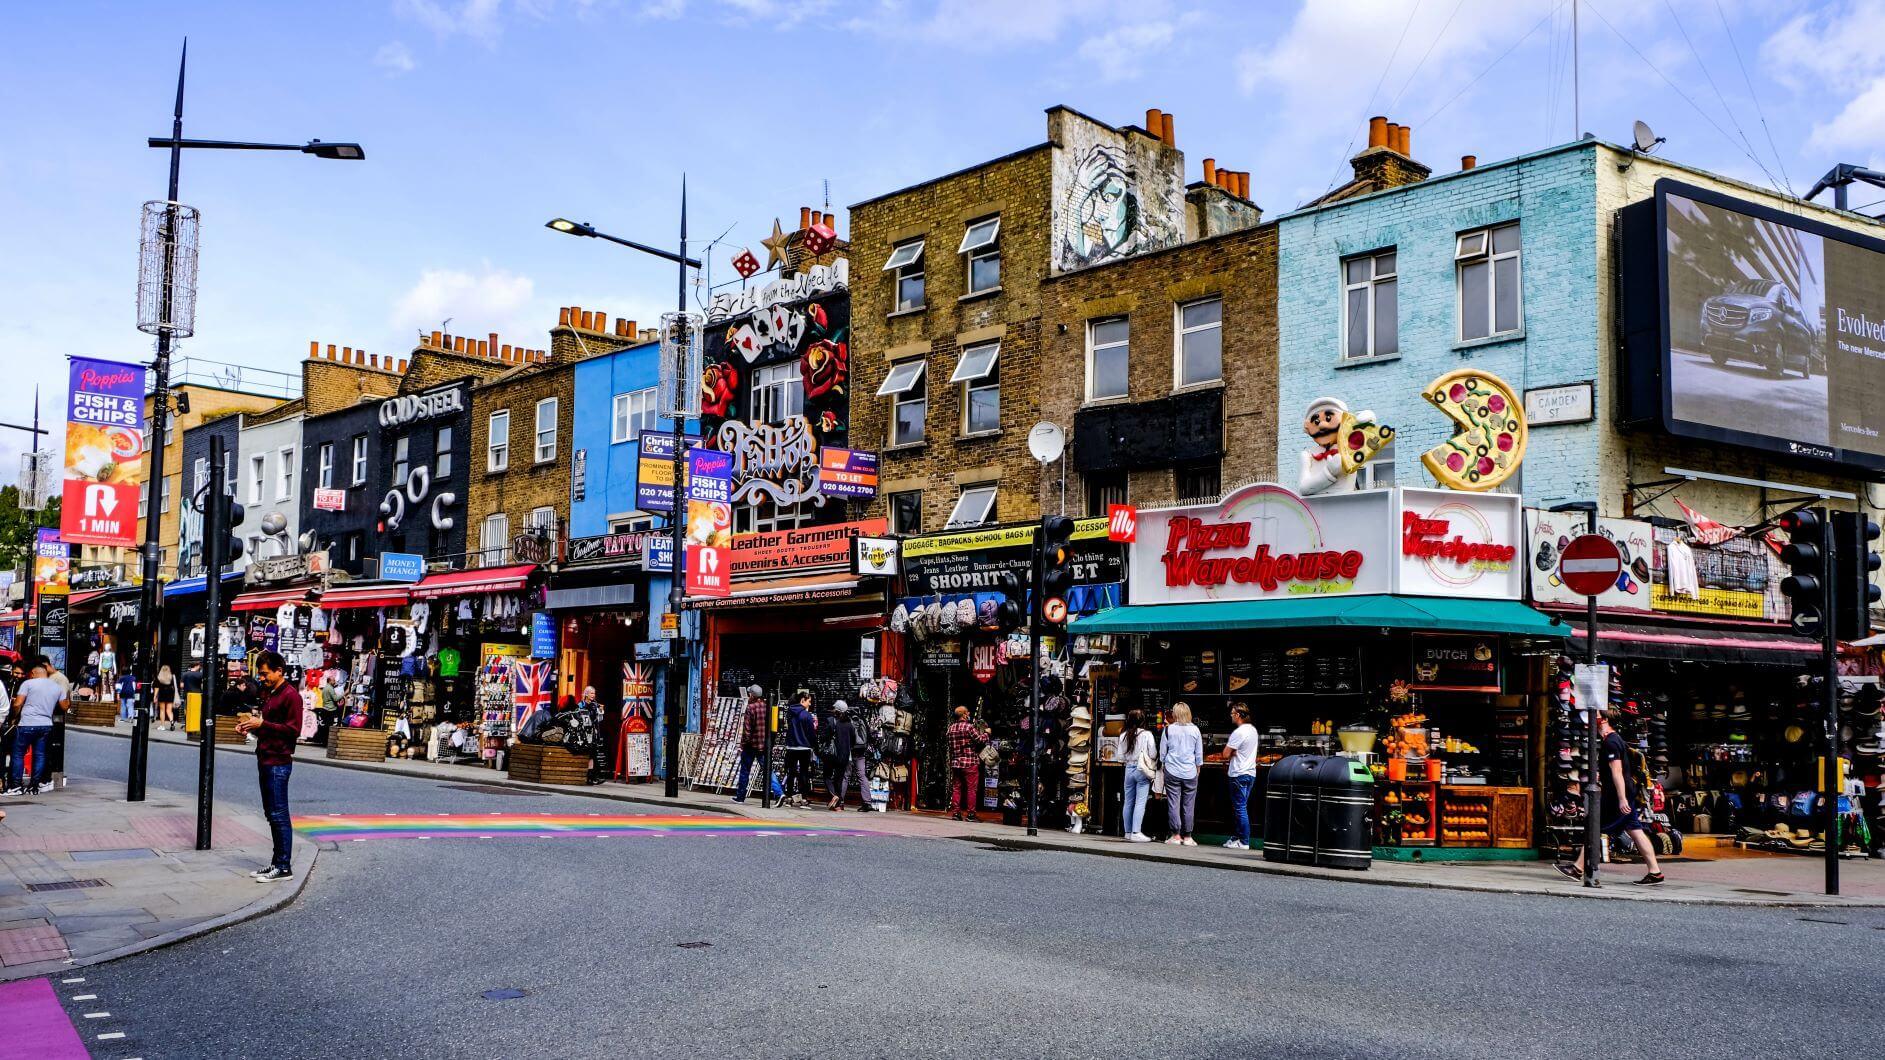 Planning a city break trip to London